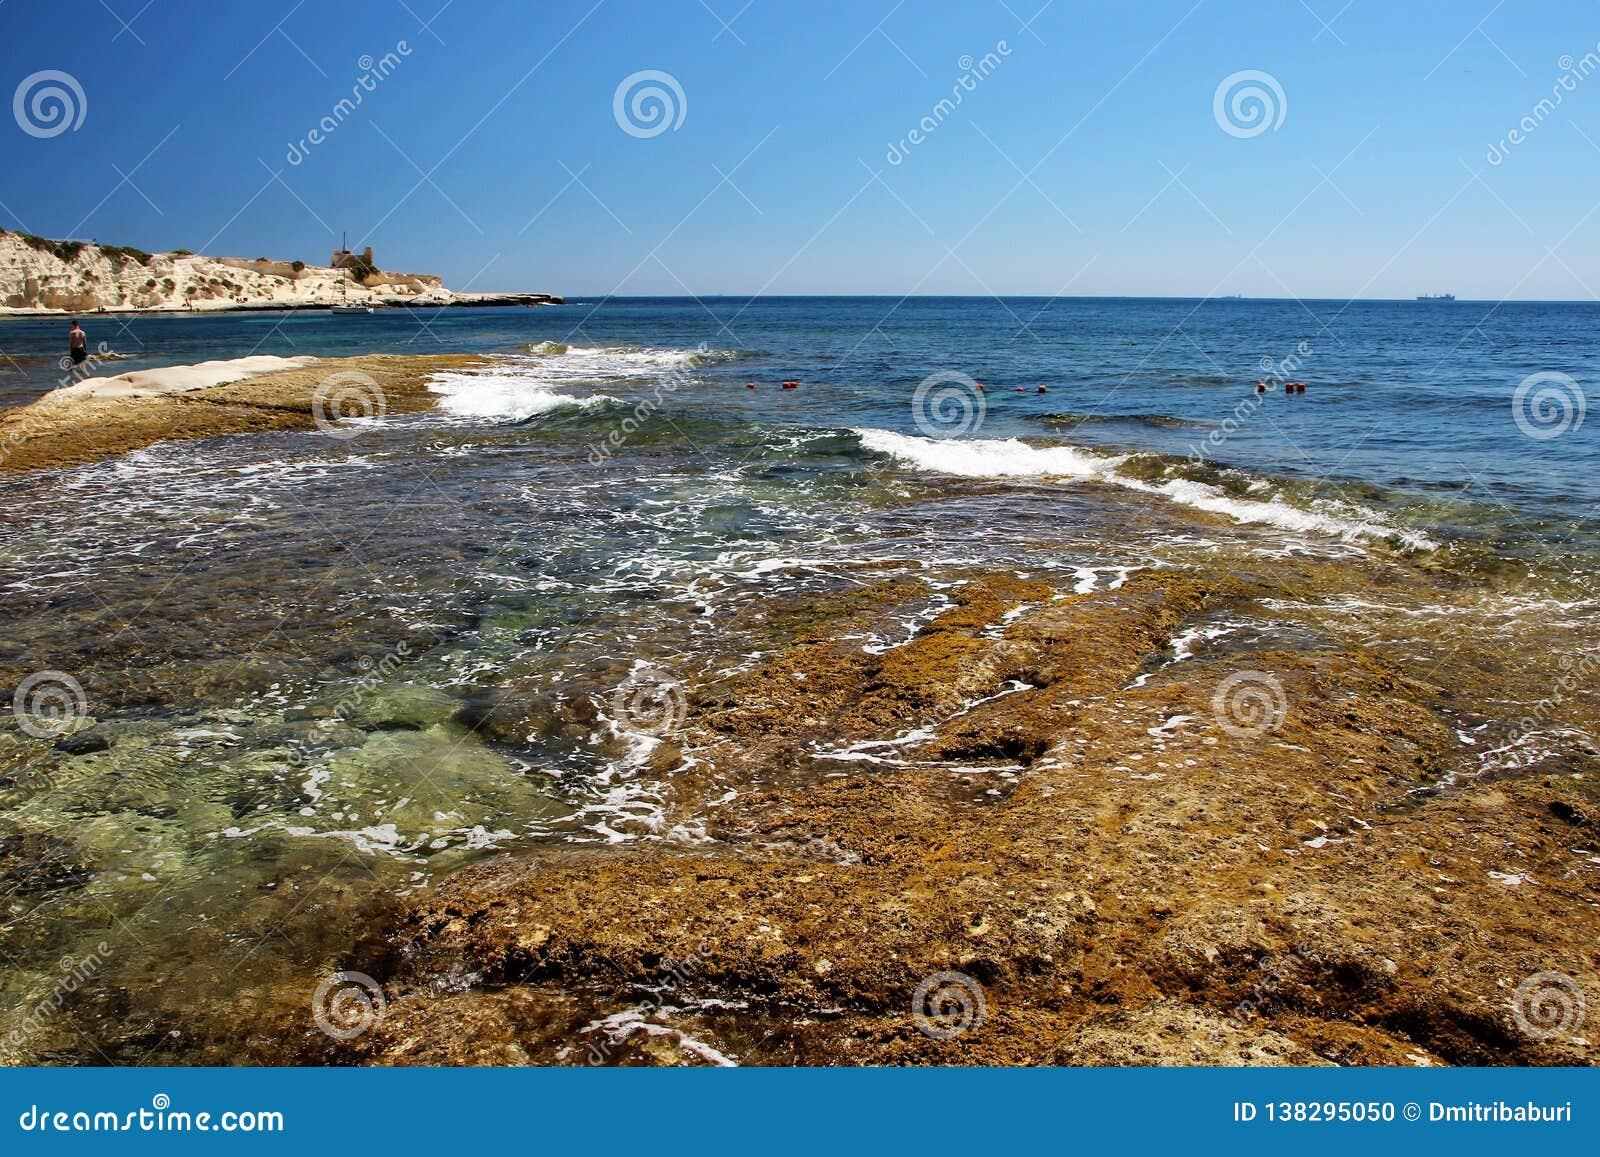 Beautiful seascape, rocky Maltese beach view.